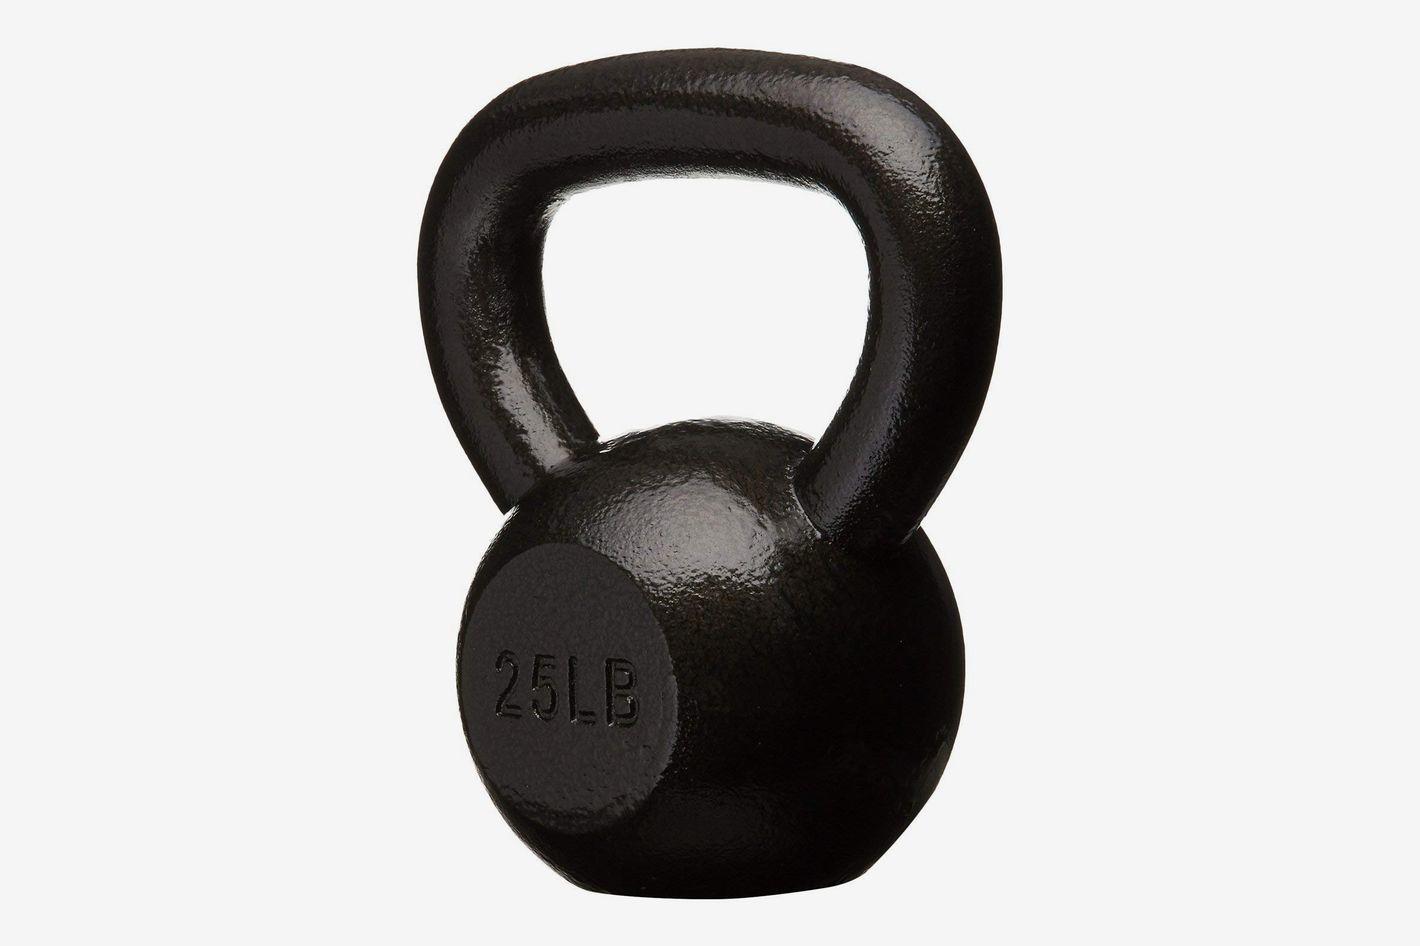 AmazonBasics Cast Iron Kettlebell (25-Pound)